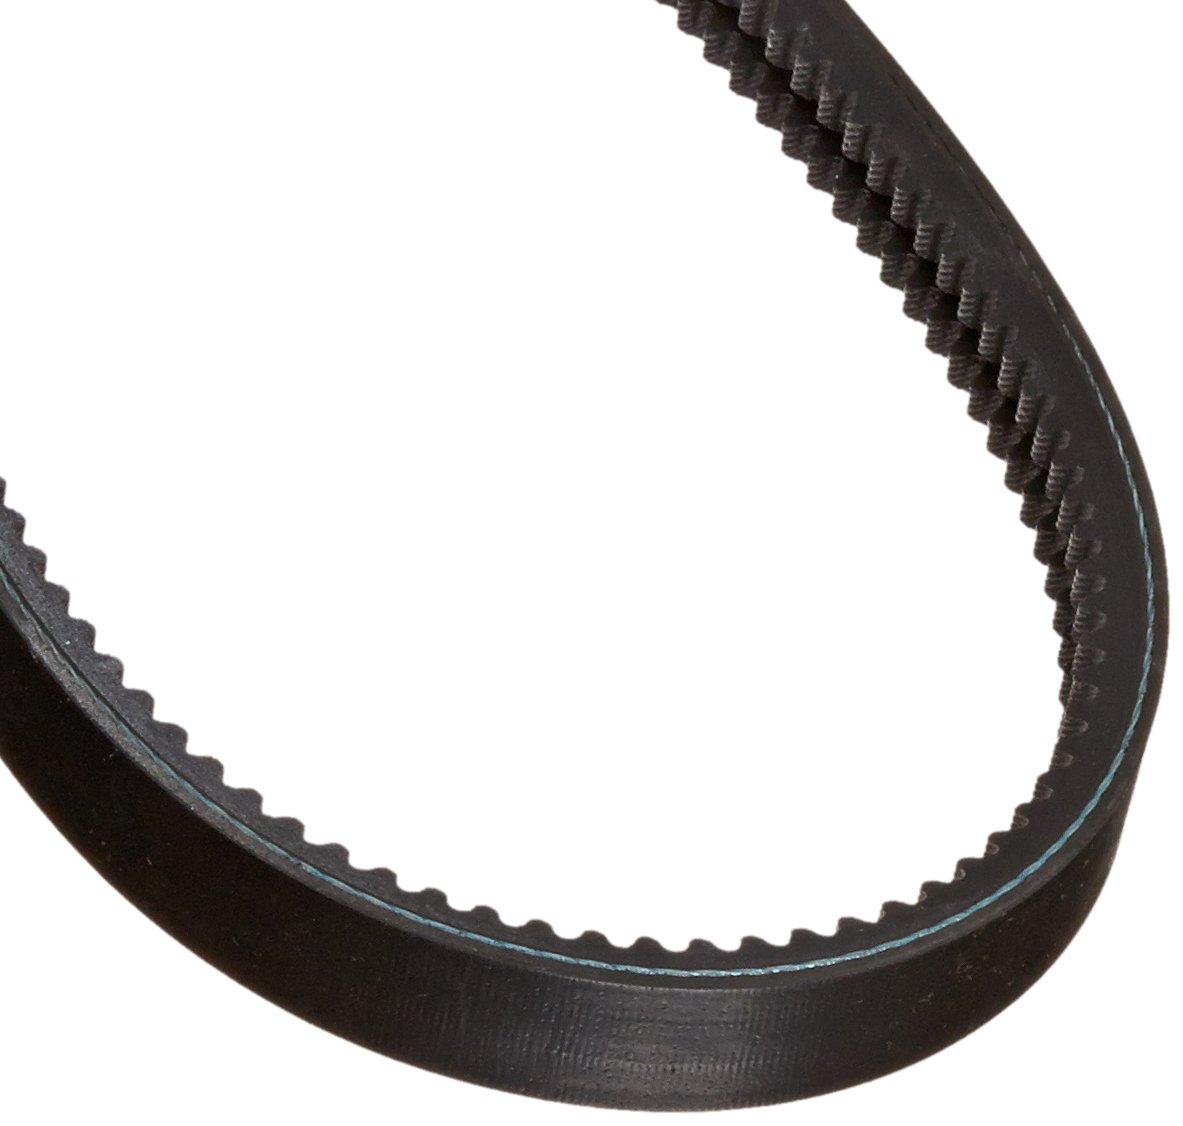 Gates 3VX300 Super HC Molded Notch Belt 21//64 Height 30 Belt Outside Circumference 3VX Section 3//8 Width